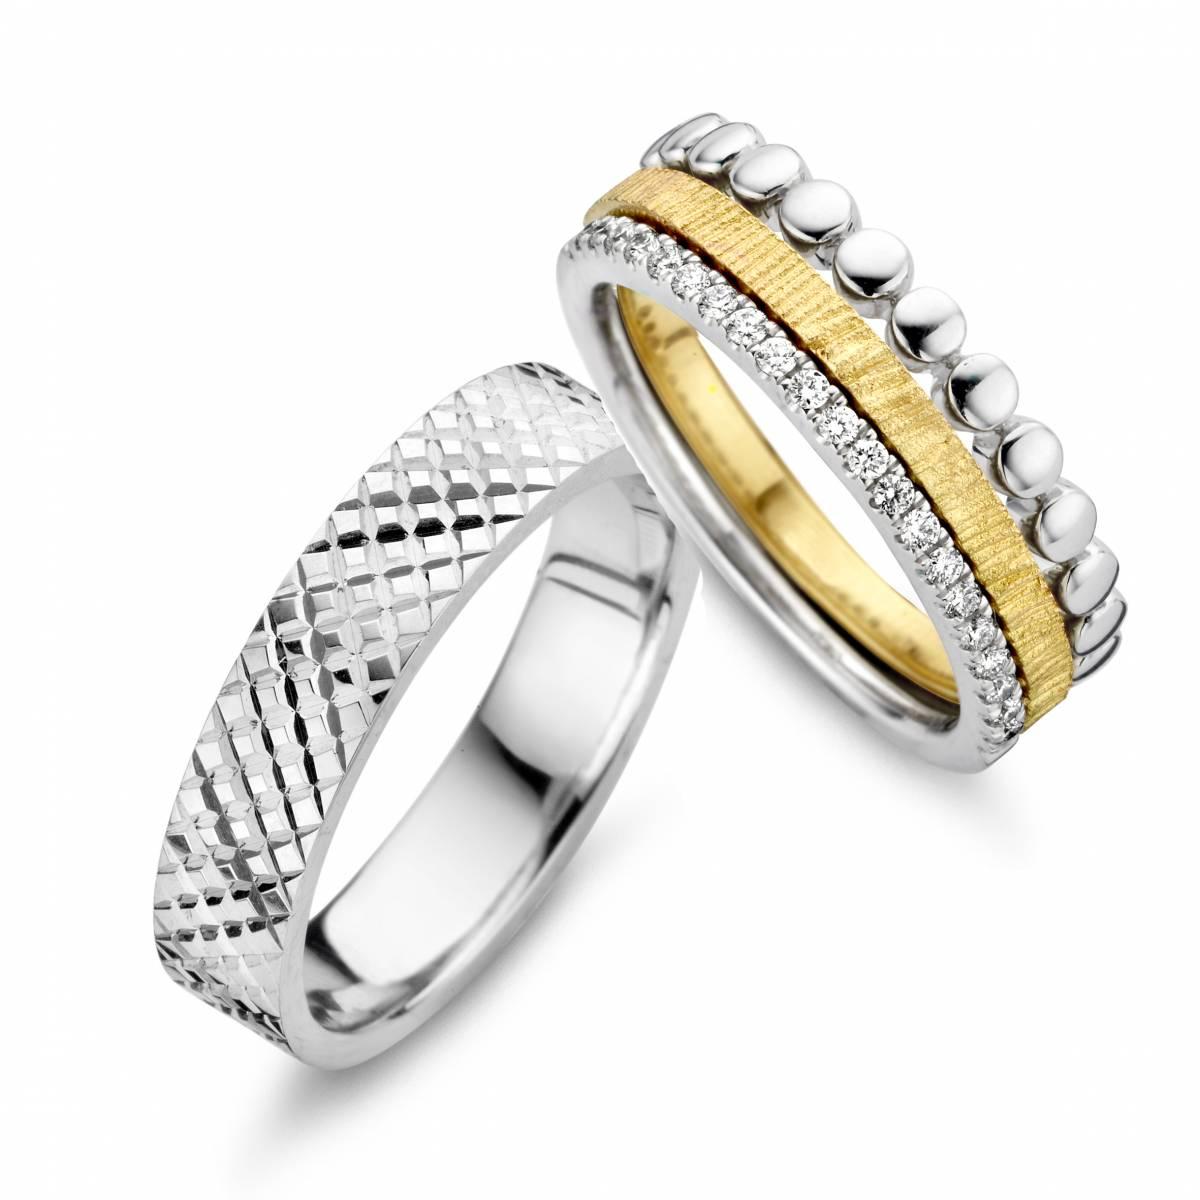 Juwelier Vandromme - Juwelen - Trouwring - Verlovingsring – House of Weddings - 80